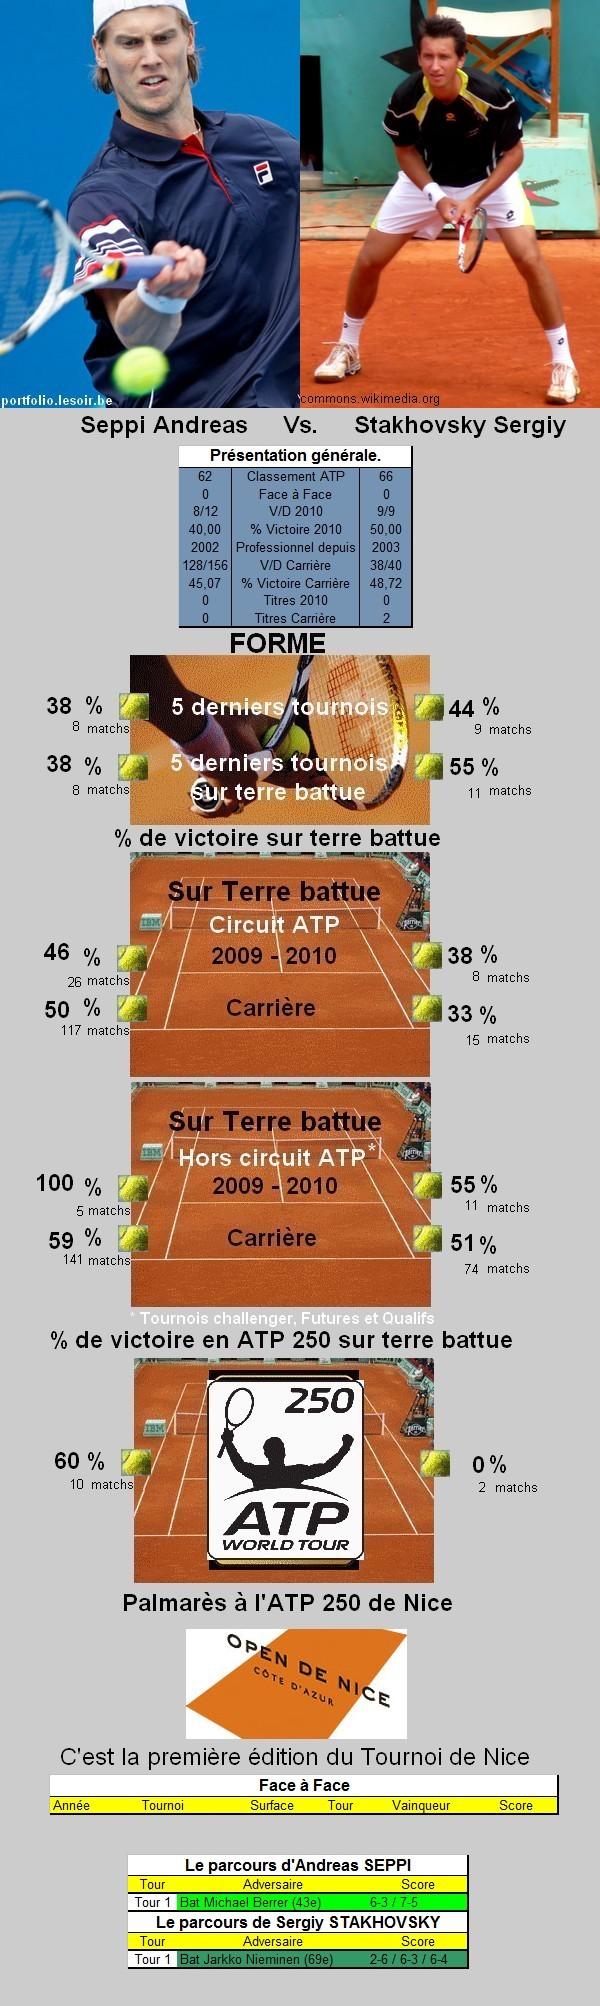 Statistiques tennis de Seppi contre Stakhovsky à Nice